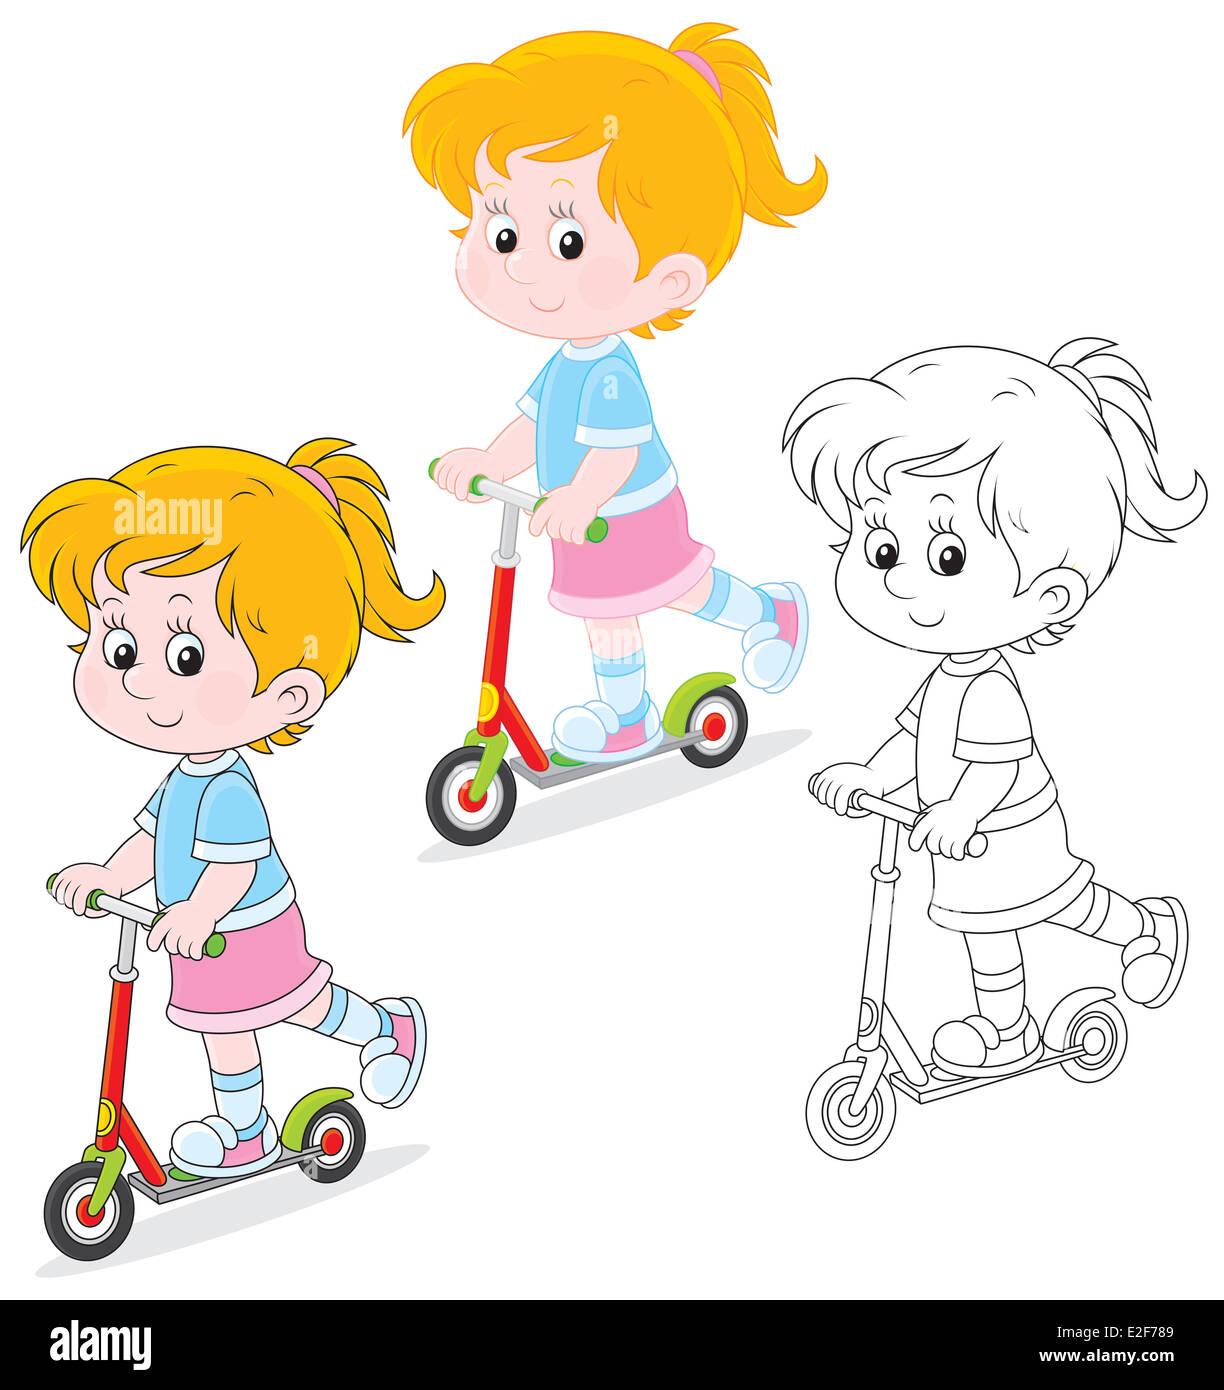 Girl scooterist - Stock Image